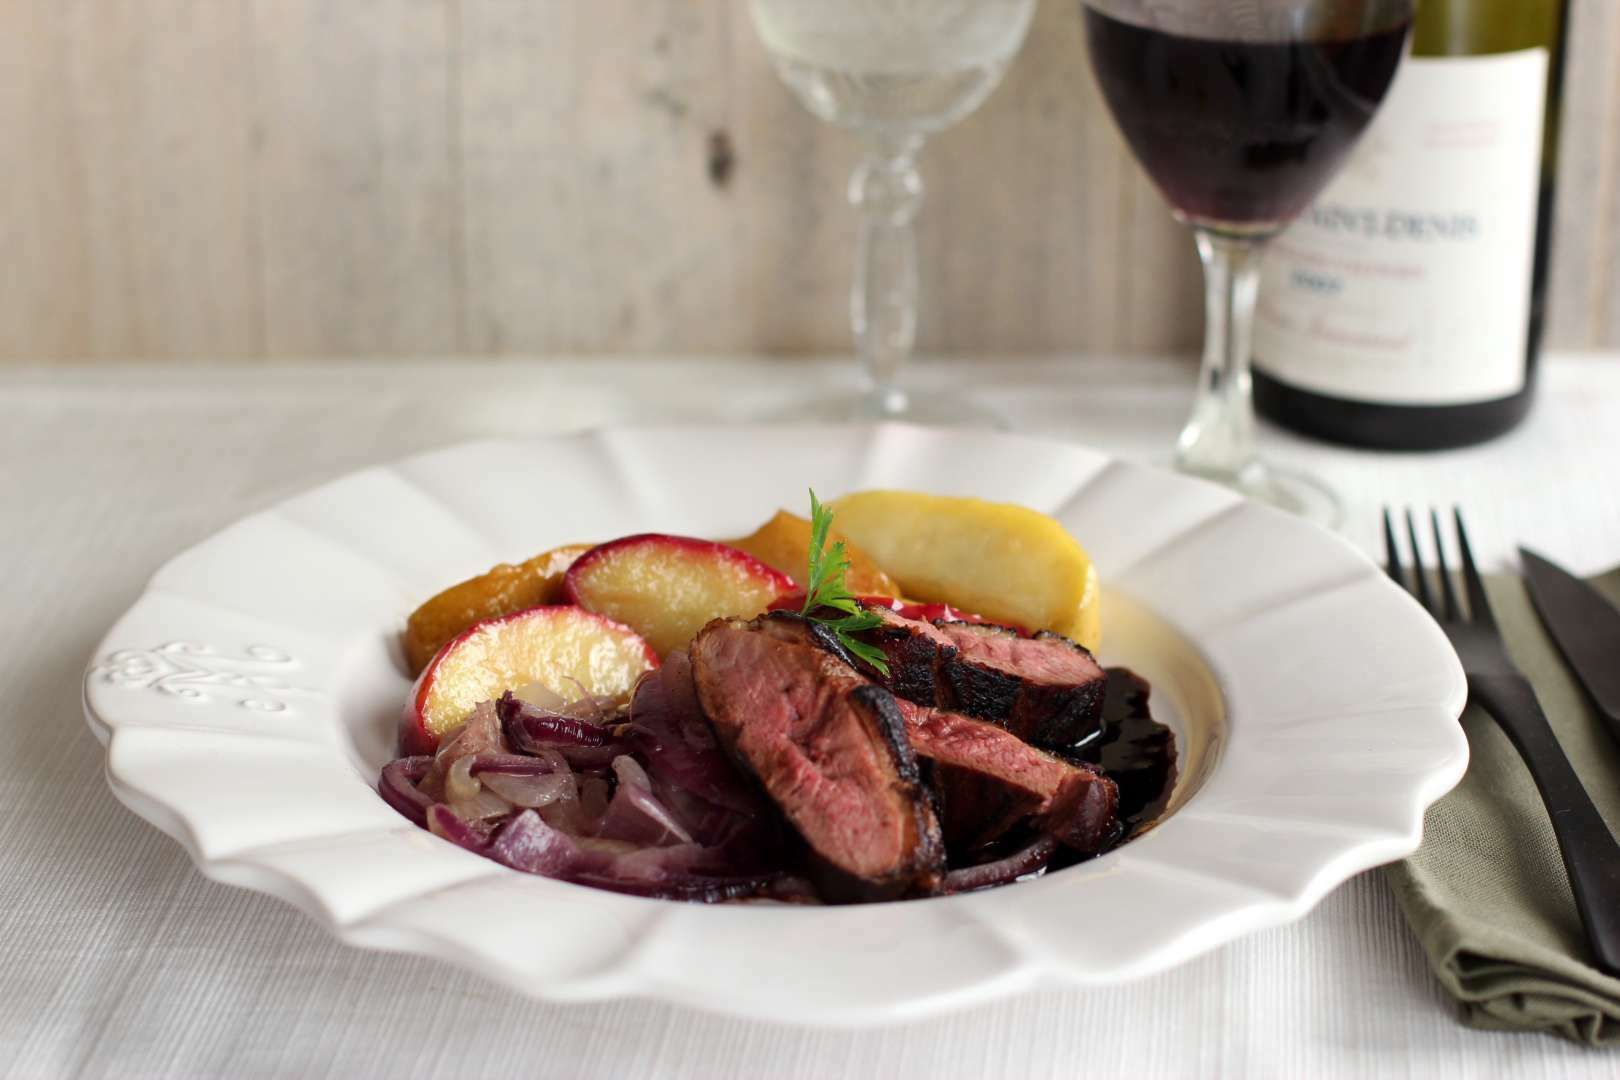 Magret de canard a l 39 aquitaine recipe petitchef for Chambre de sucre gourmet artisanal sugars